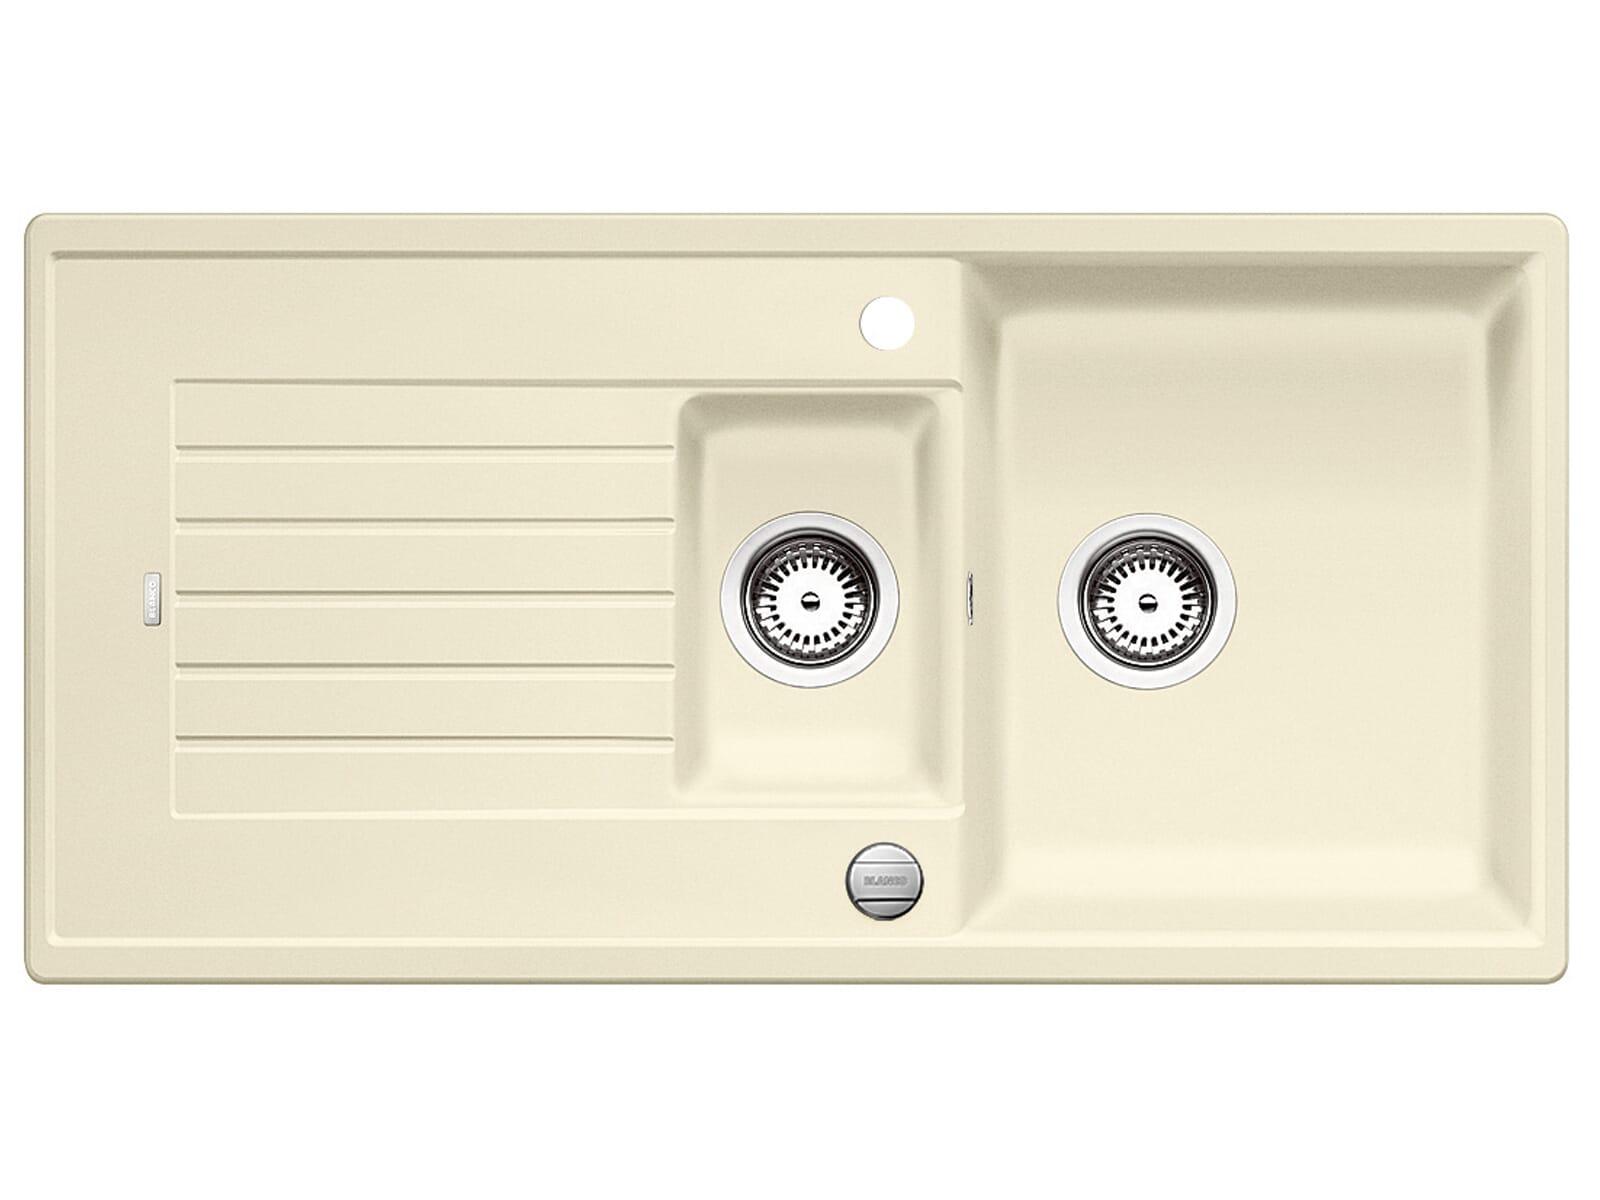 Blanco Zia 6 S Jasmin - 514 735  Granitspüle